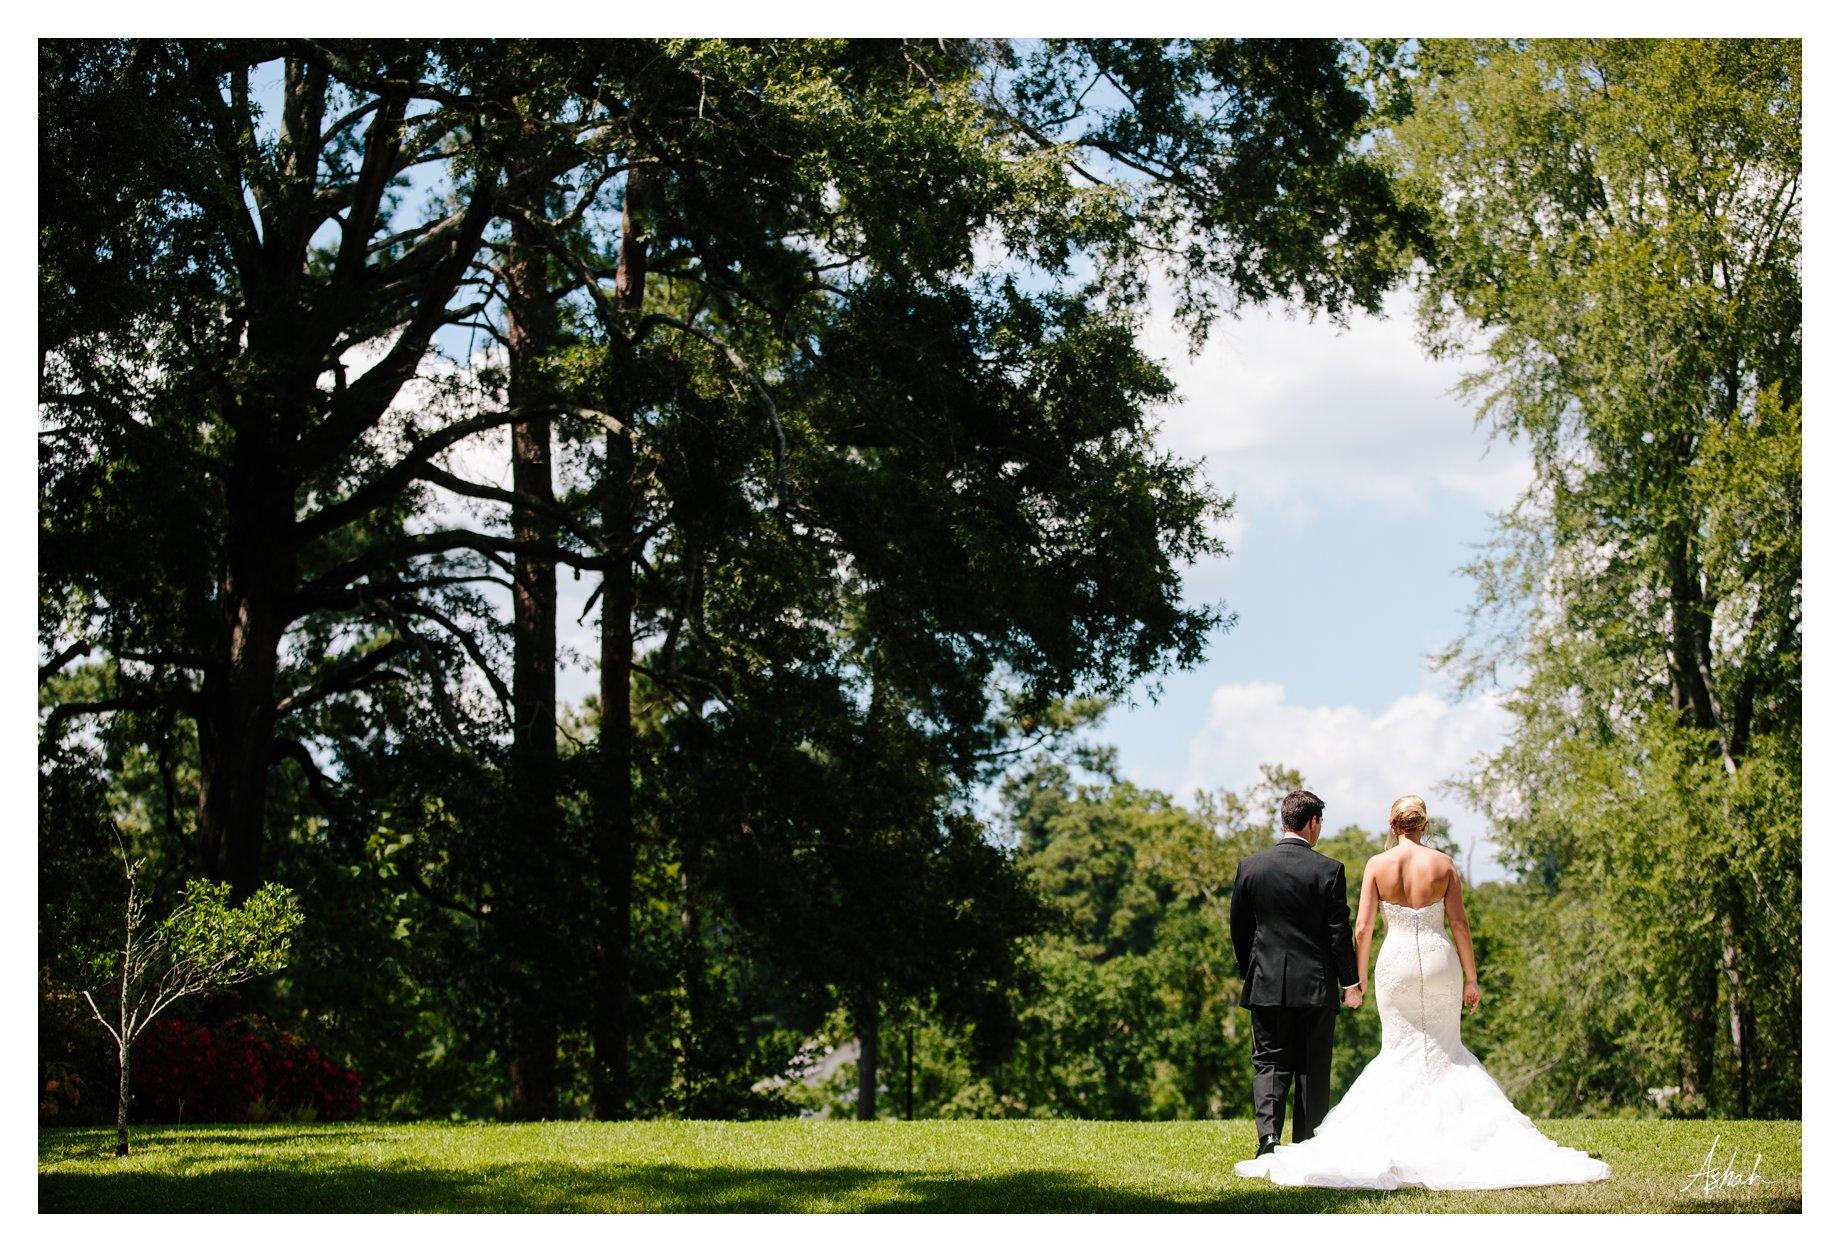 Holding Hands Forever - Macon Wedding Photographer